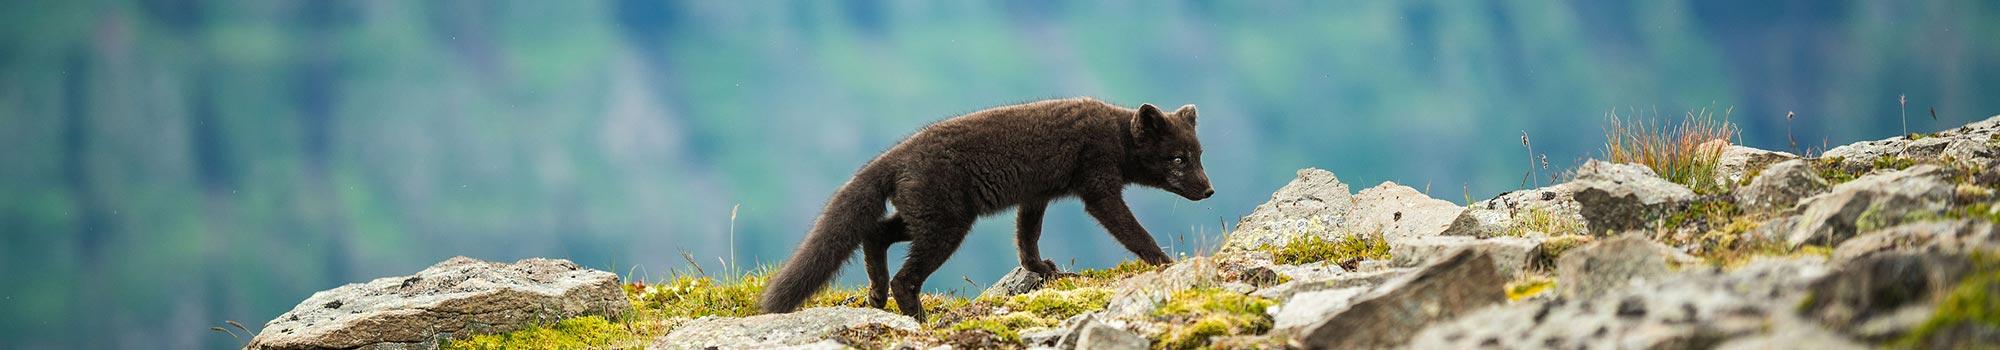 wilderness-animal